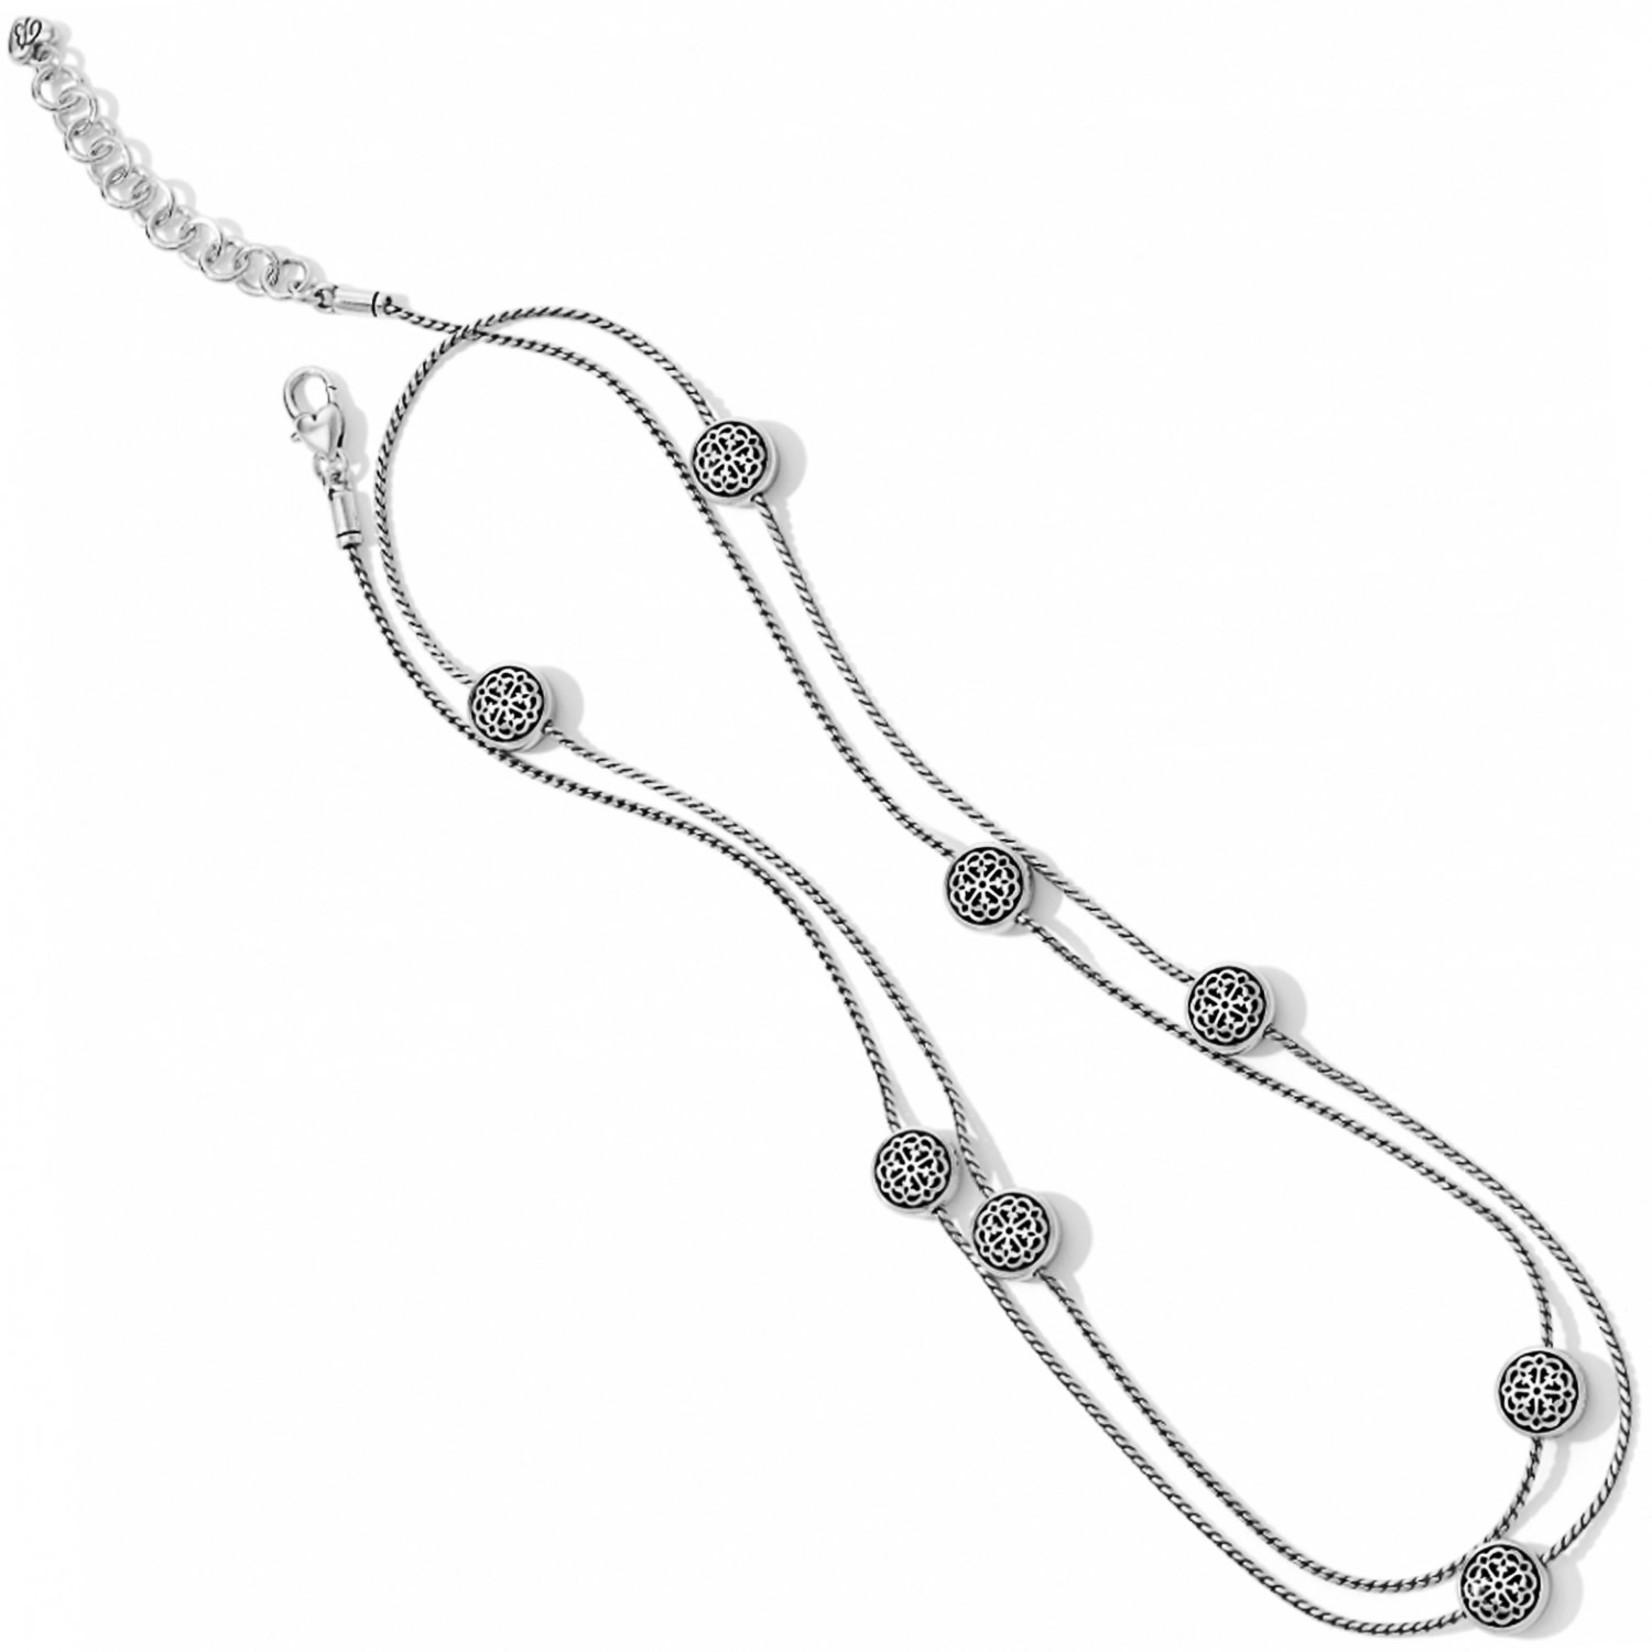 Brighton Ferrara Petite Long Necklace